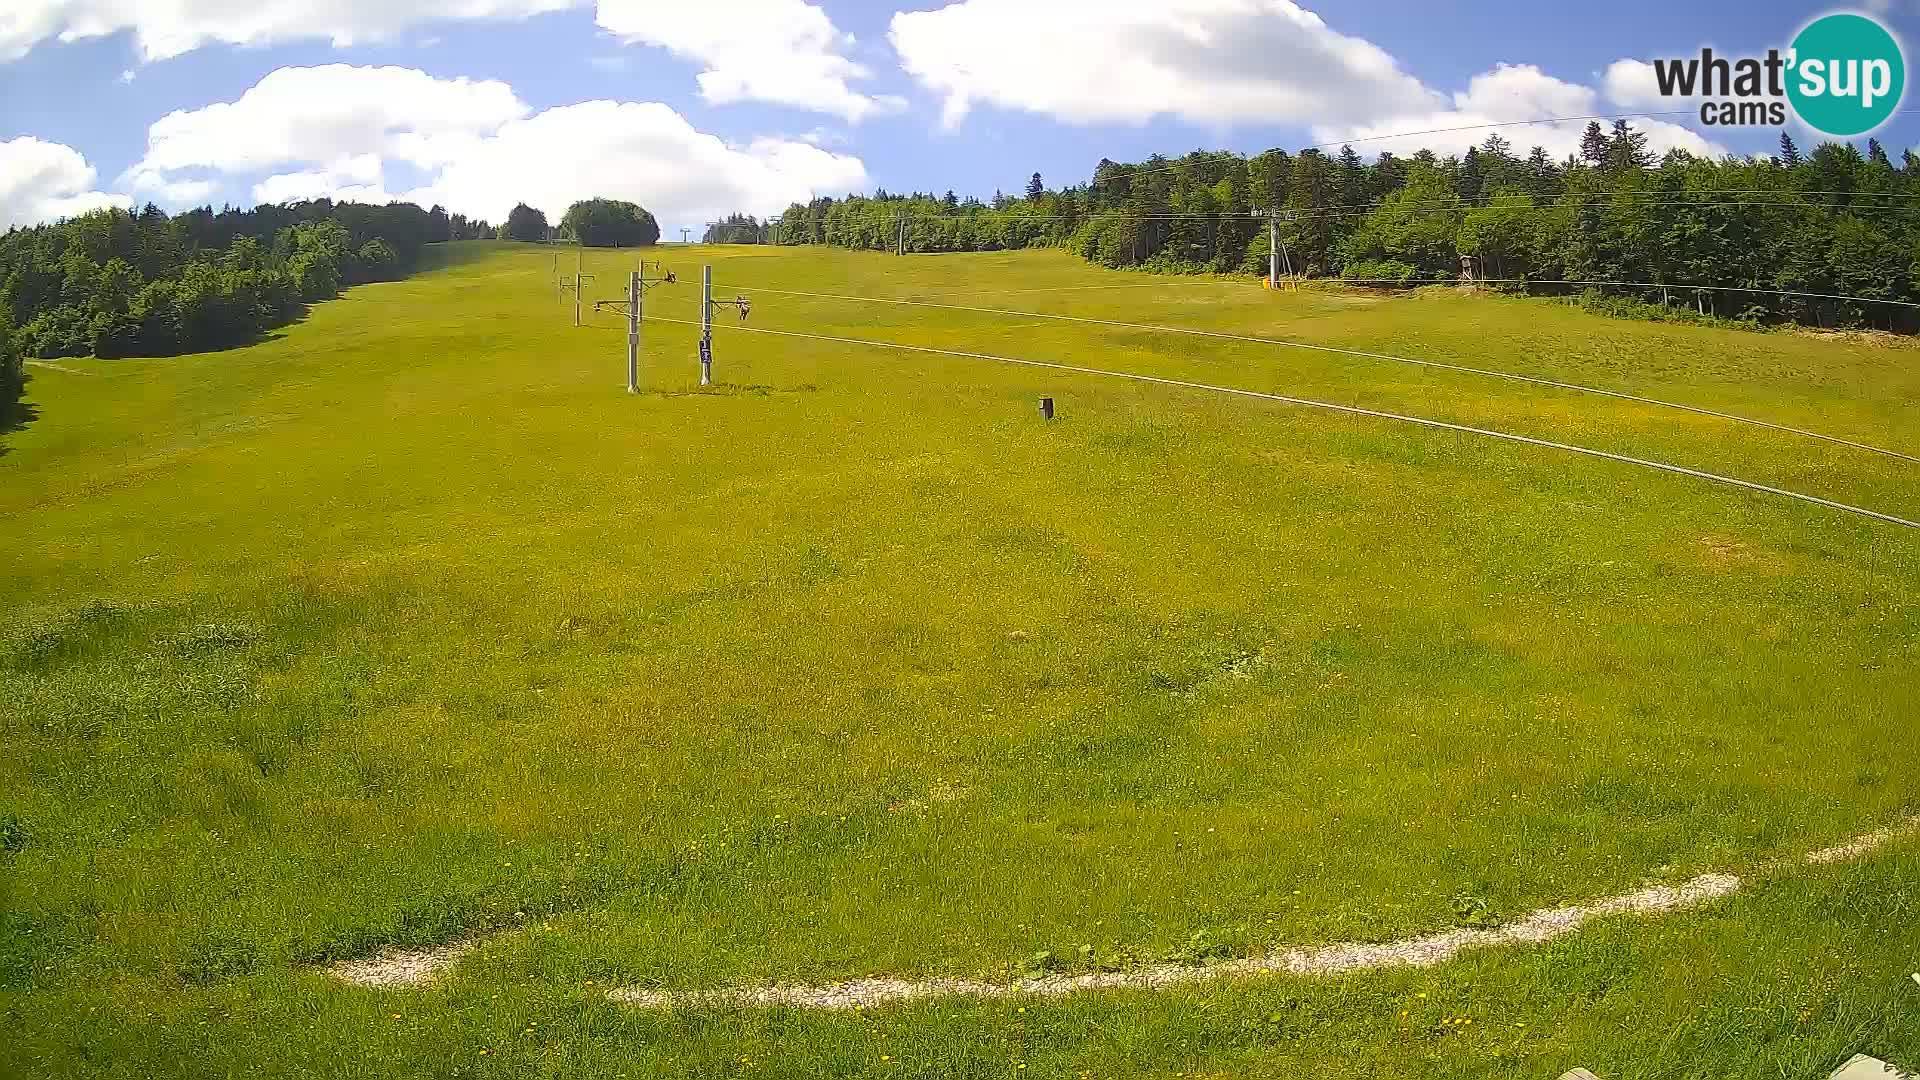 Station ski Maribor Pohorje – Cojzerica